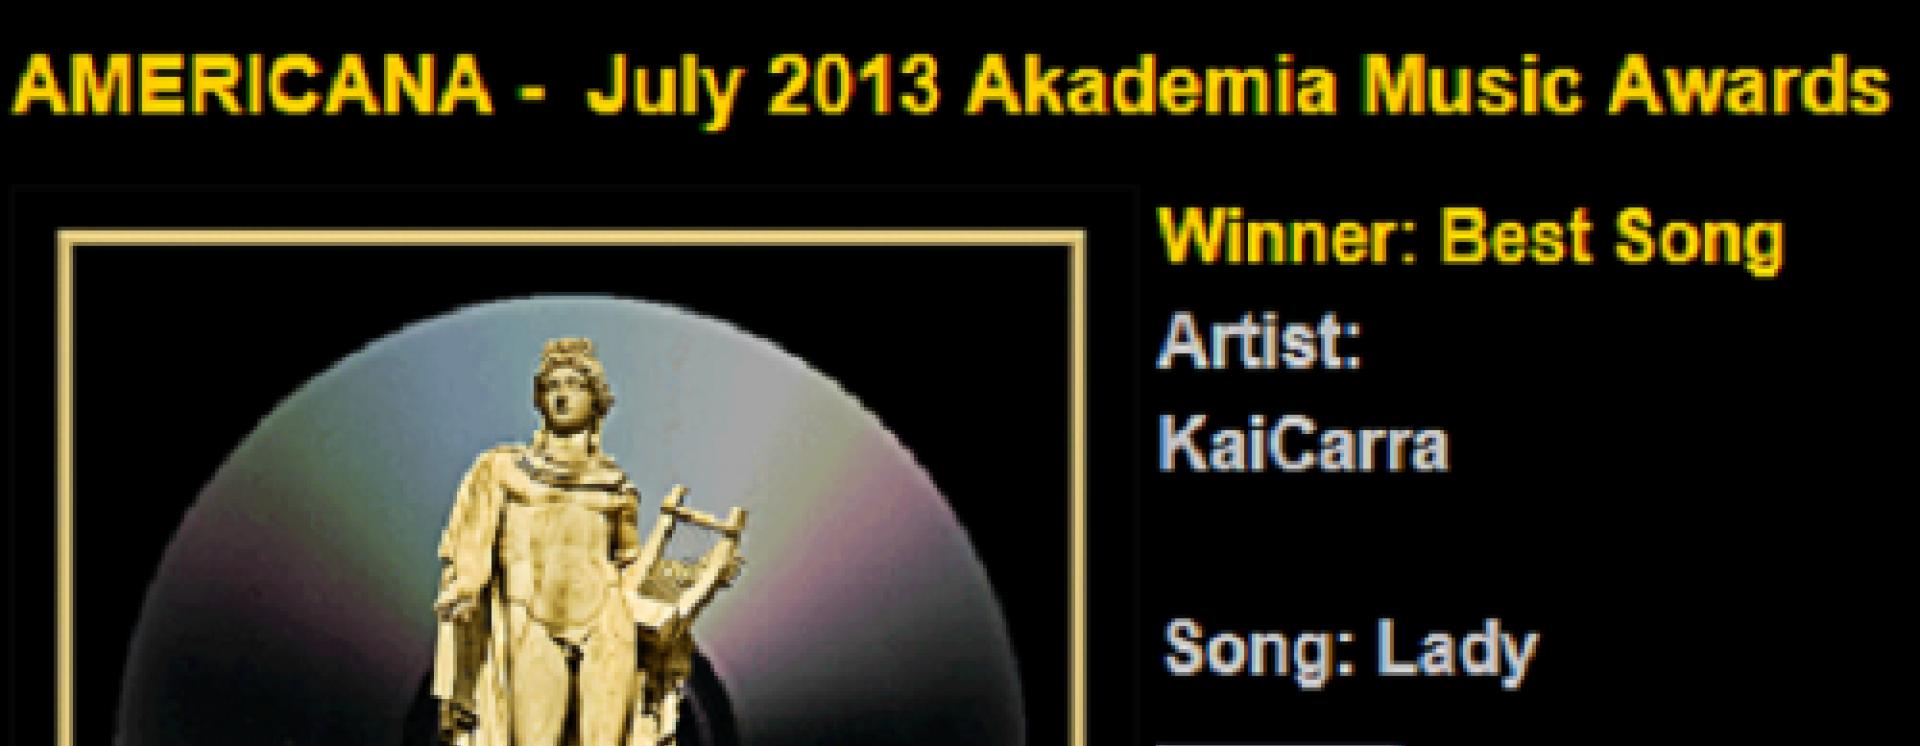 1375414236 akademia music award kaicarra small 2 copy